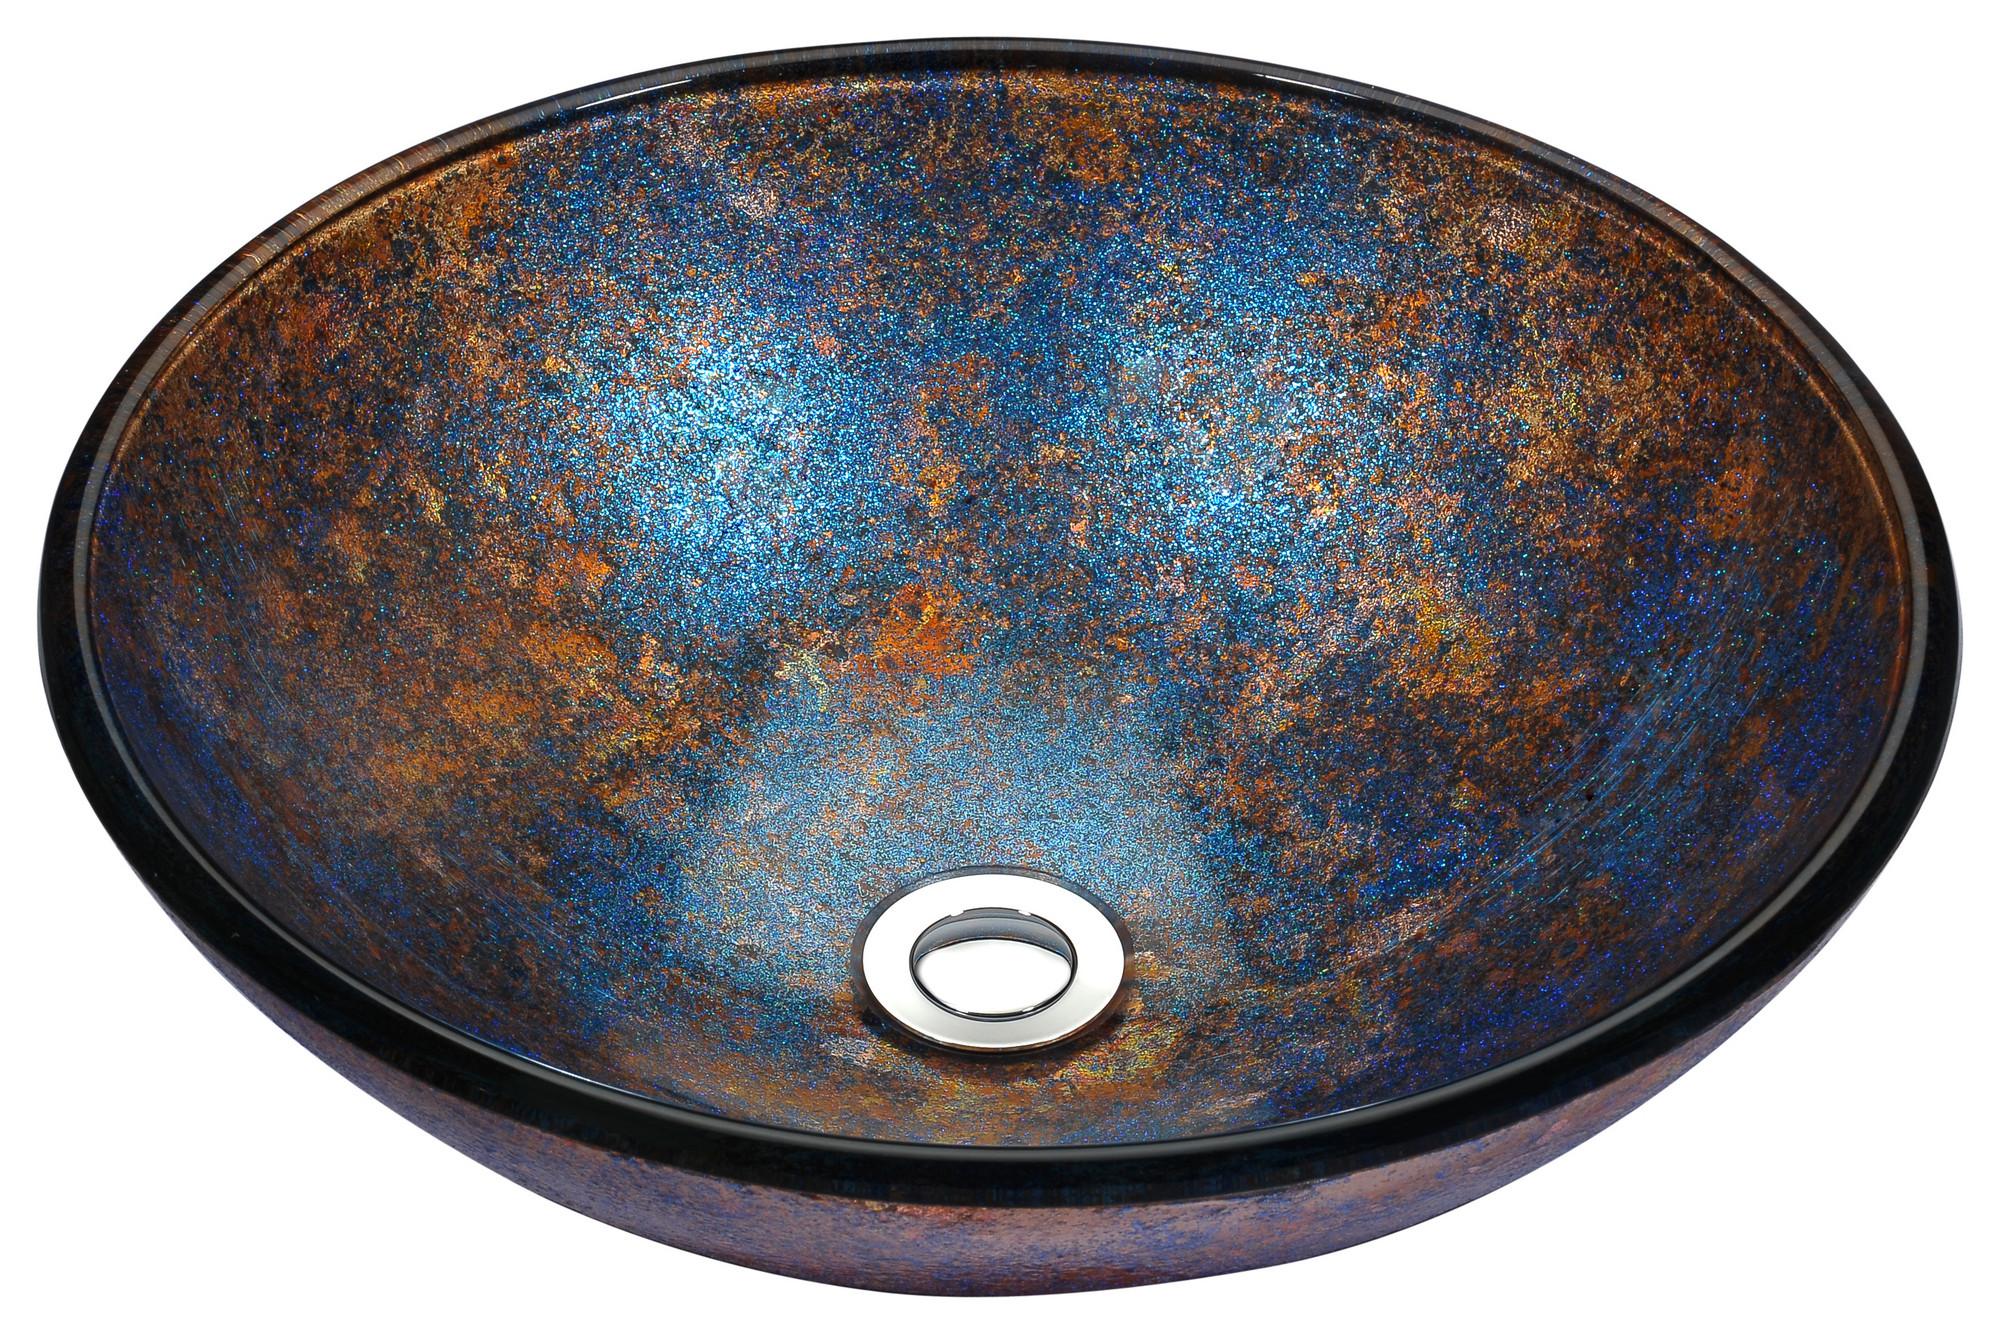 ANZZI LS-AZ173 Stellar Series Deco-Glass Vessel Sink In Sapphire Burst